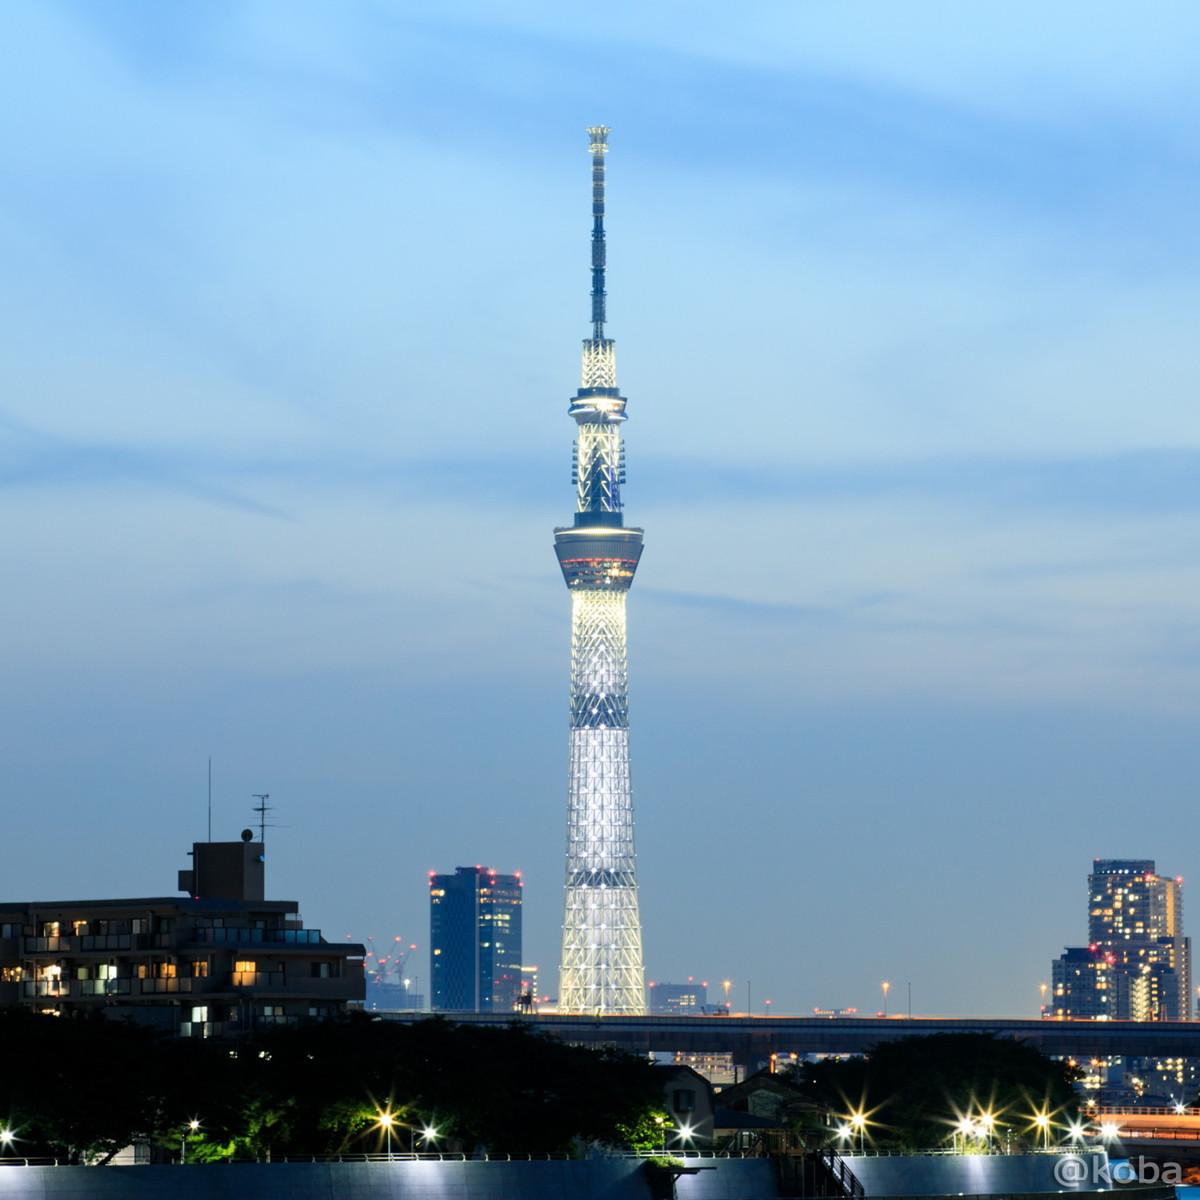 LED照明器具を最大限に近い明度で白色にライティング、展望台の赤がアクセント。│東京スカイツリー│葛飾区で撮影したスカイツリーです。│2017年5月21日│こばフォトブログ